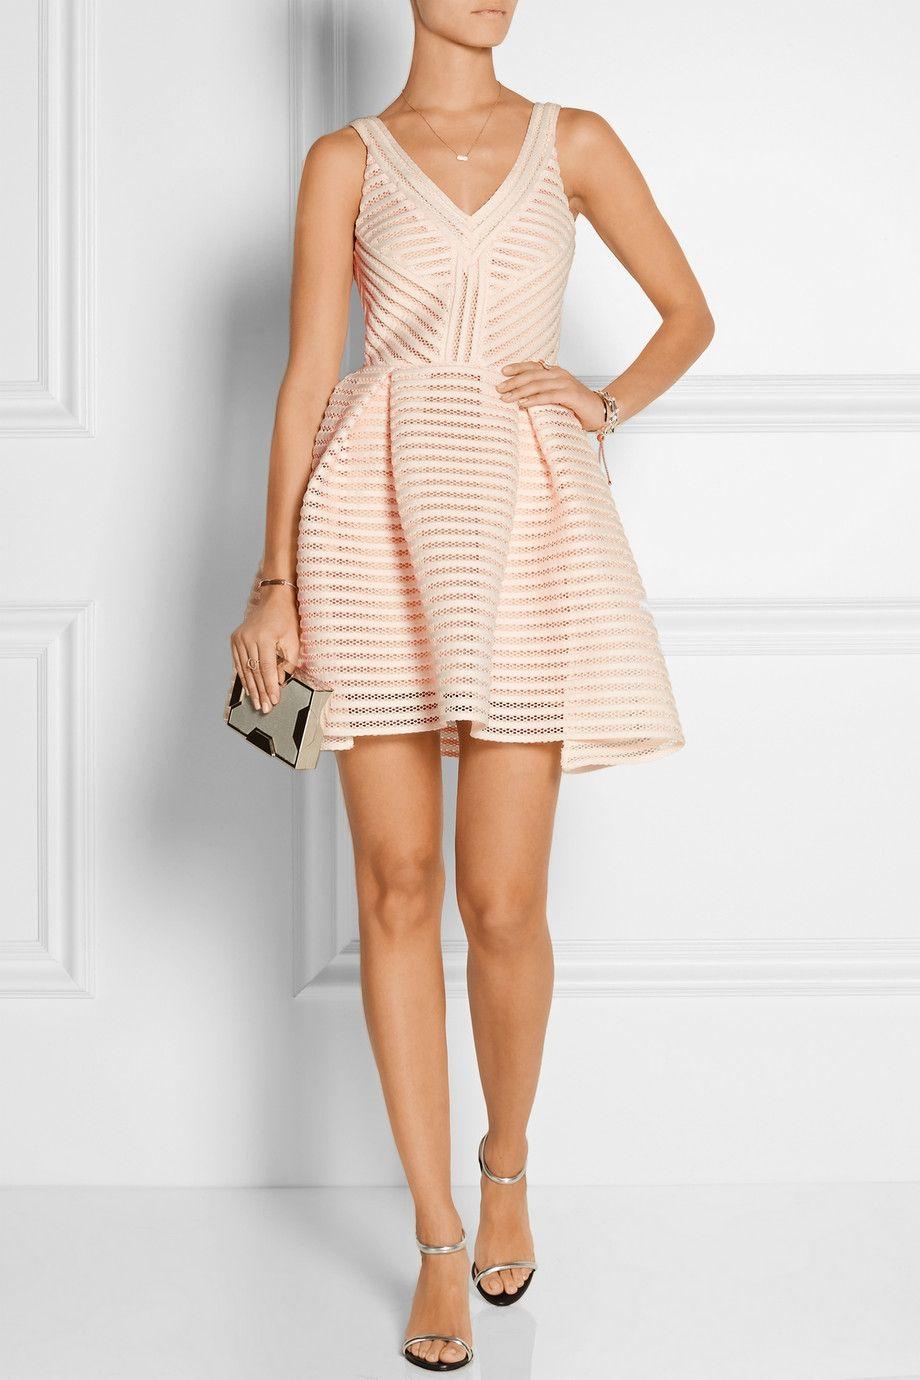 bc549db0a58890 Robe courte rose pastel à rayures, col en V, cintrée, pochette, Rayure  mesh-striped jersey mini dress